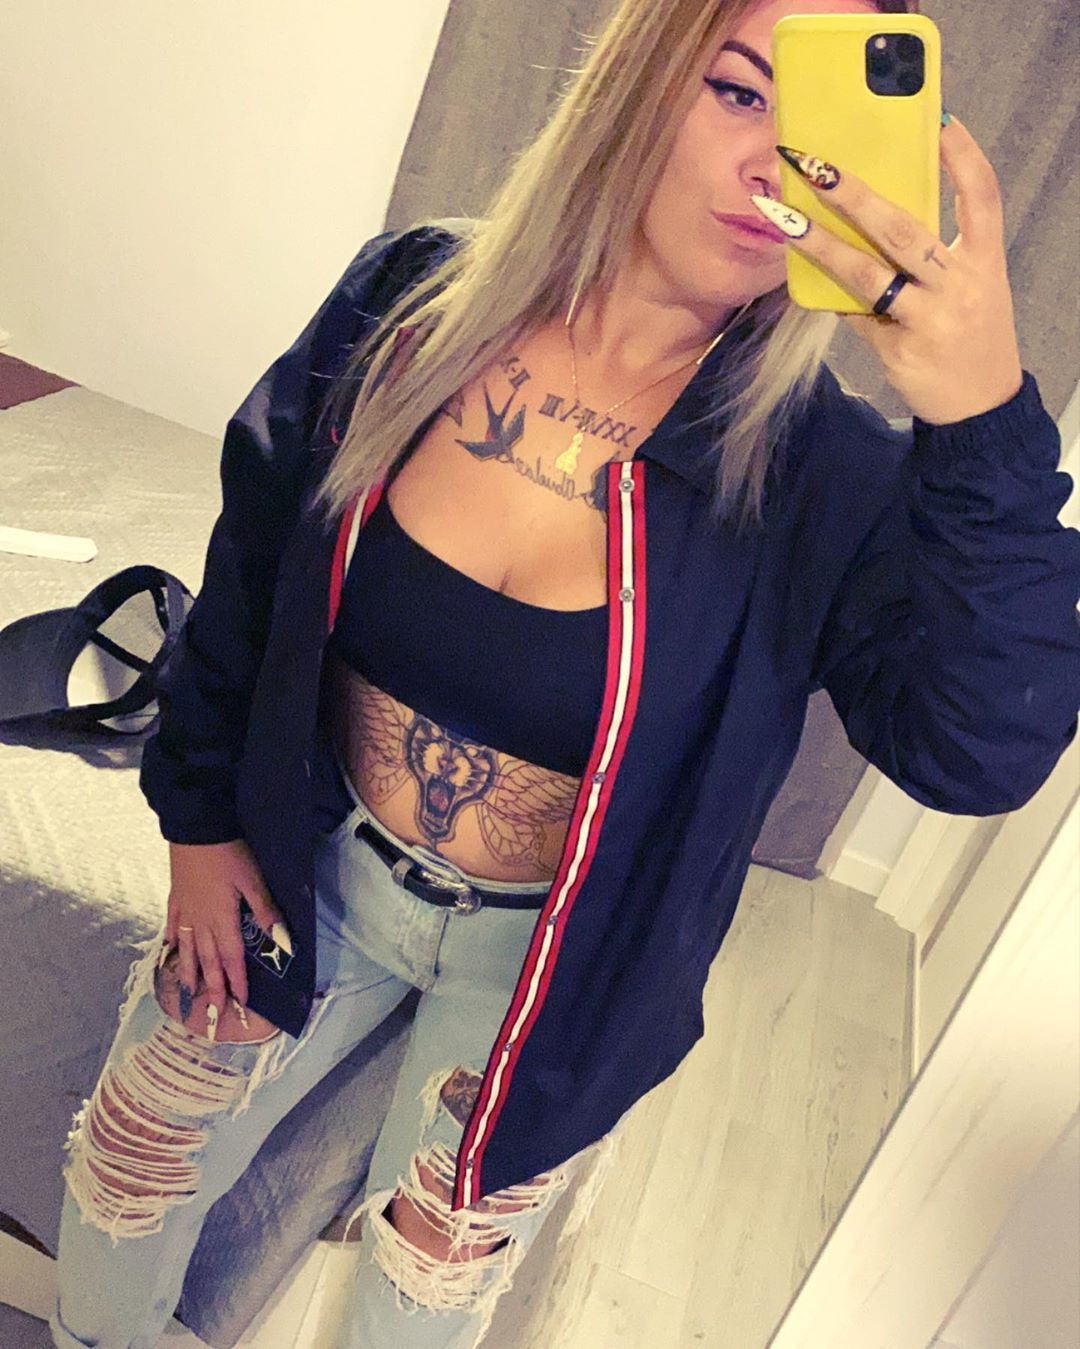 6. Existe la triple cara, y sí, tuve dudas de eso. . . . #tattoo #tatuajes #tattoos #tattoed #tattoedgirl #rubia #ink #inktattoo #summer #summervibes #summer2020 #verano2020 #reflexiones #followforfollowback #followme #summerend #septiembre #september #septum #septumpiercing